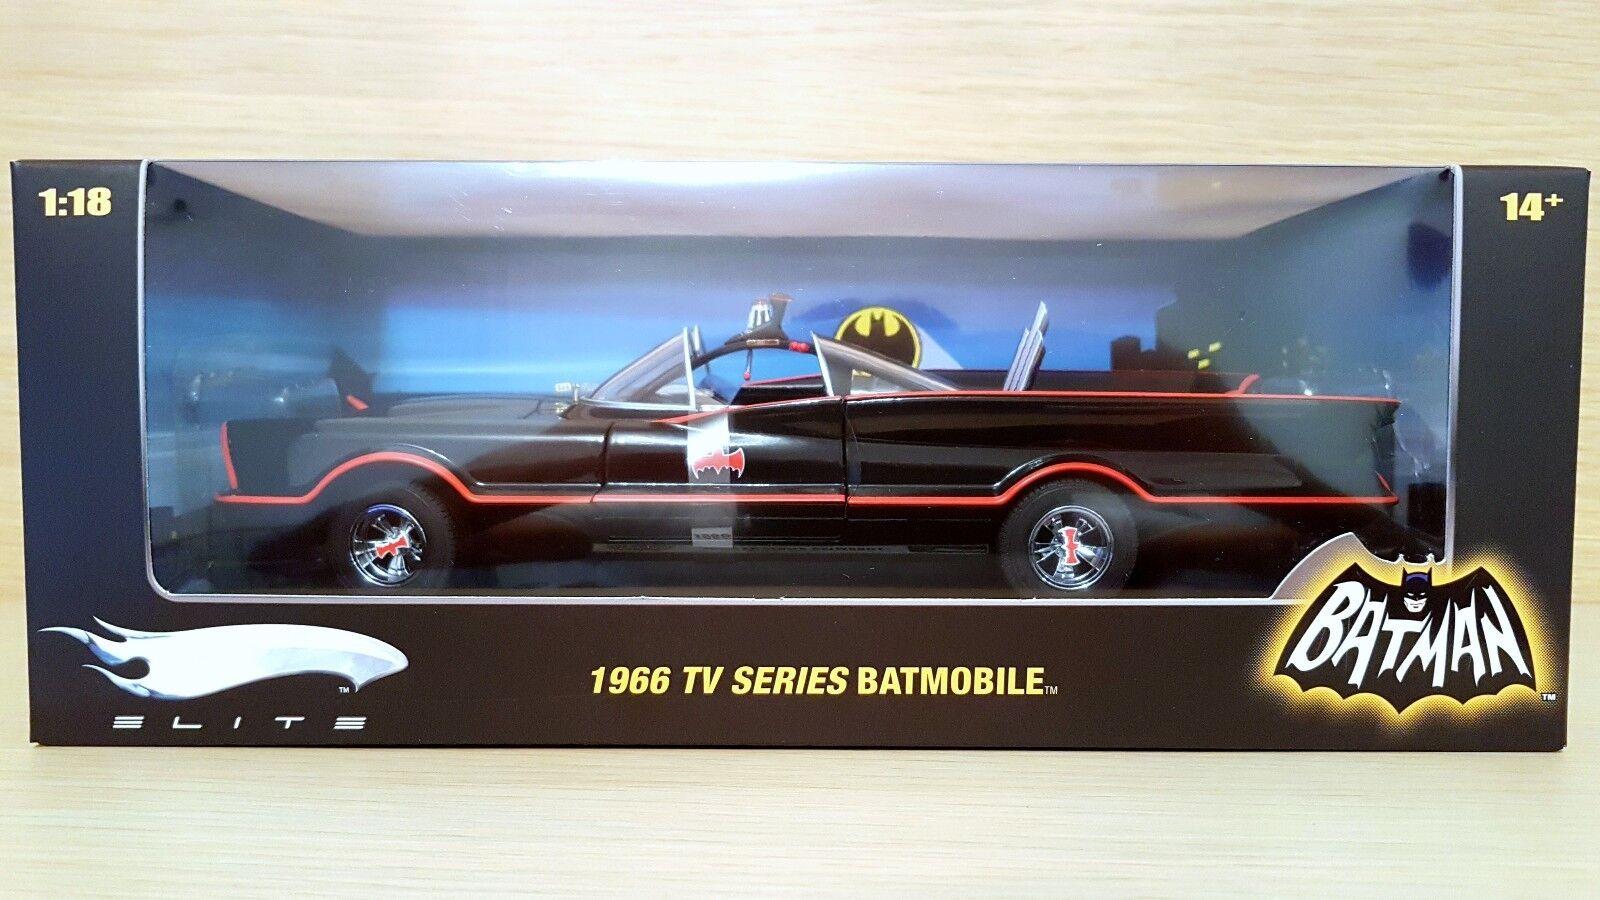 Batman 1966 Tv Series Batmobile 1st series scala 1 18 Hot Wheels Elite L7130